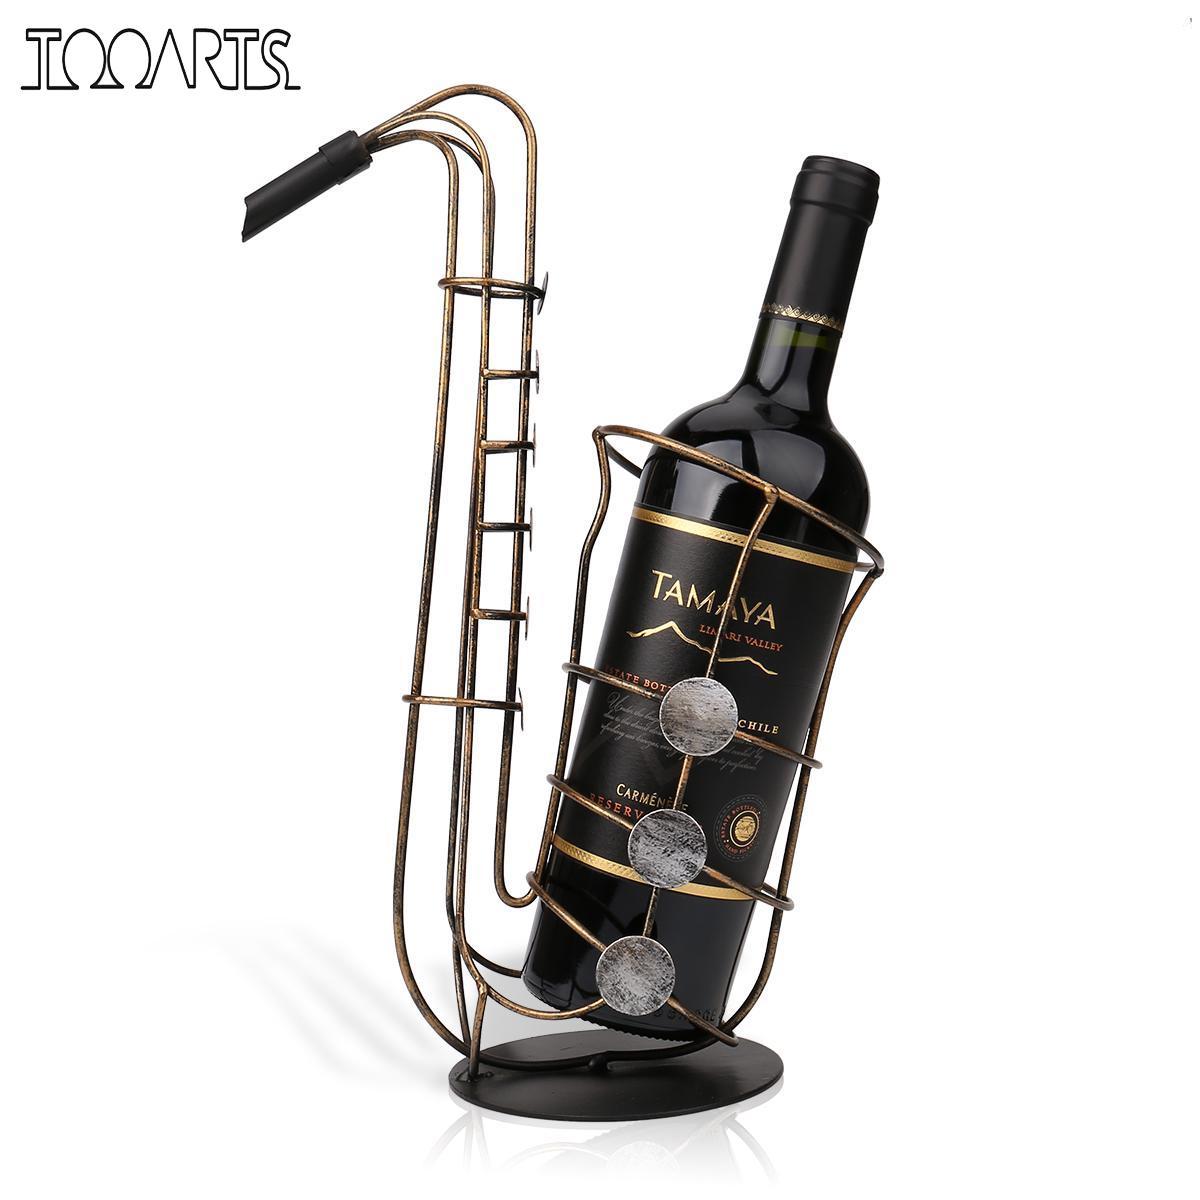 Tooarts Metal Sax Wine Rack Beautiful Crafts Artwork Gift Wine Holder Figurines Creative Wine Bottle Stand Practical Decoration